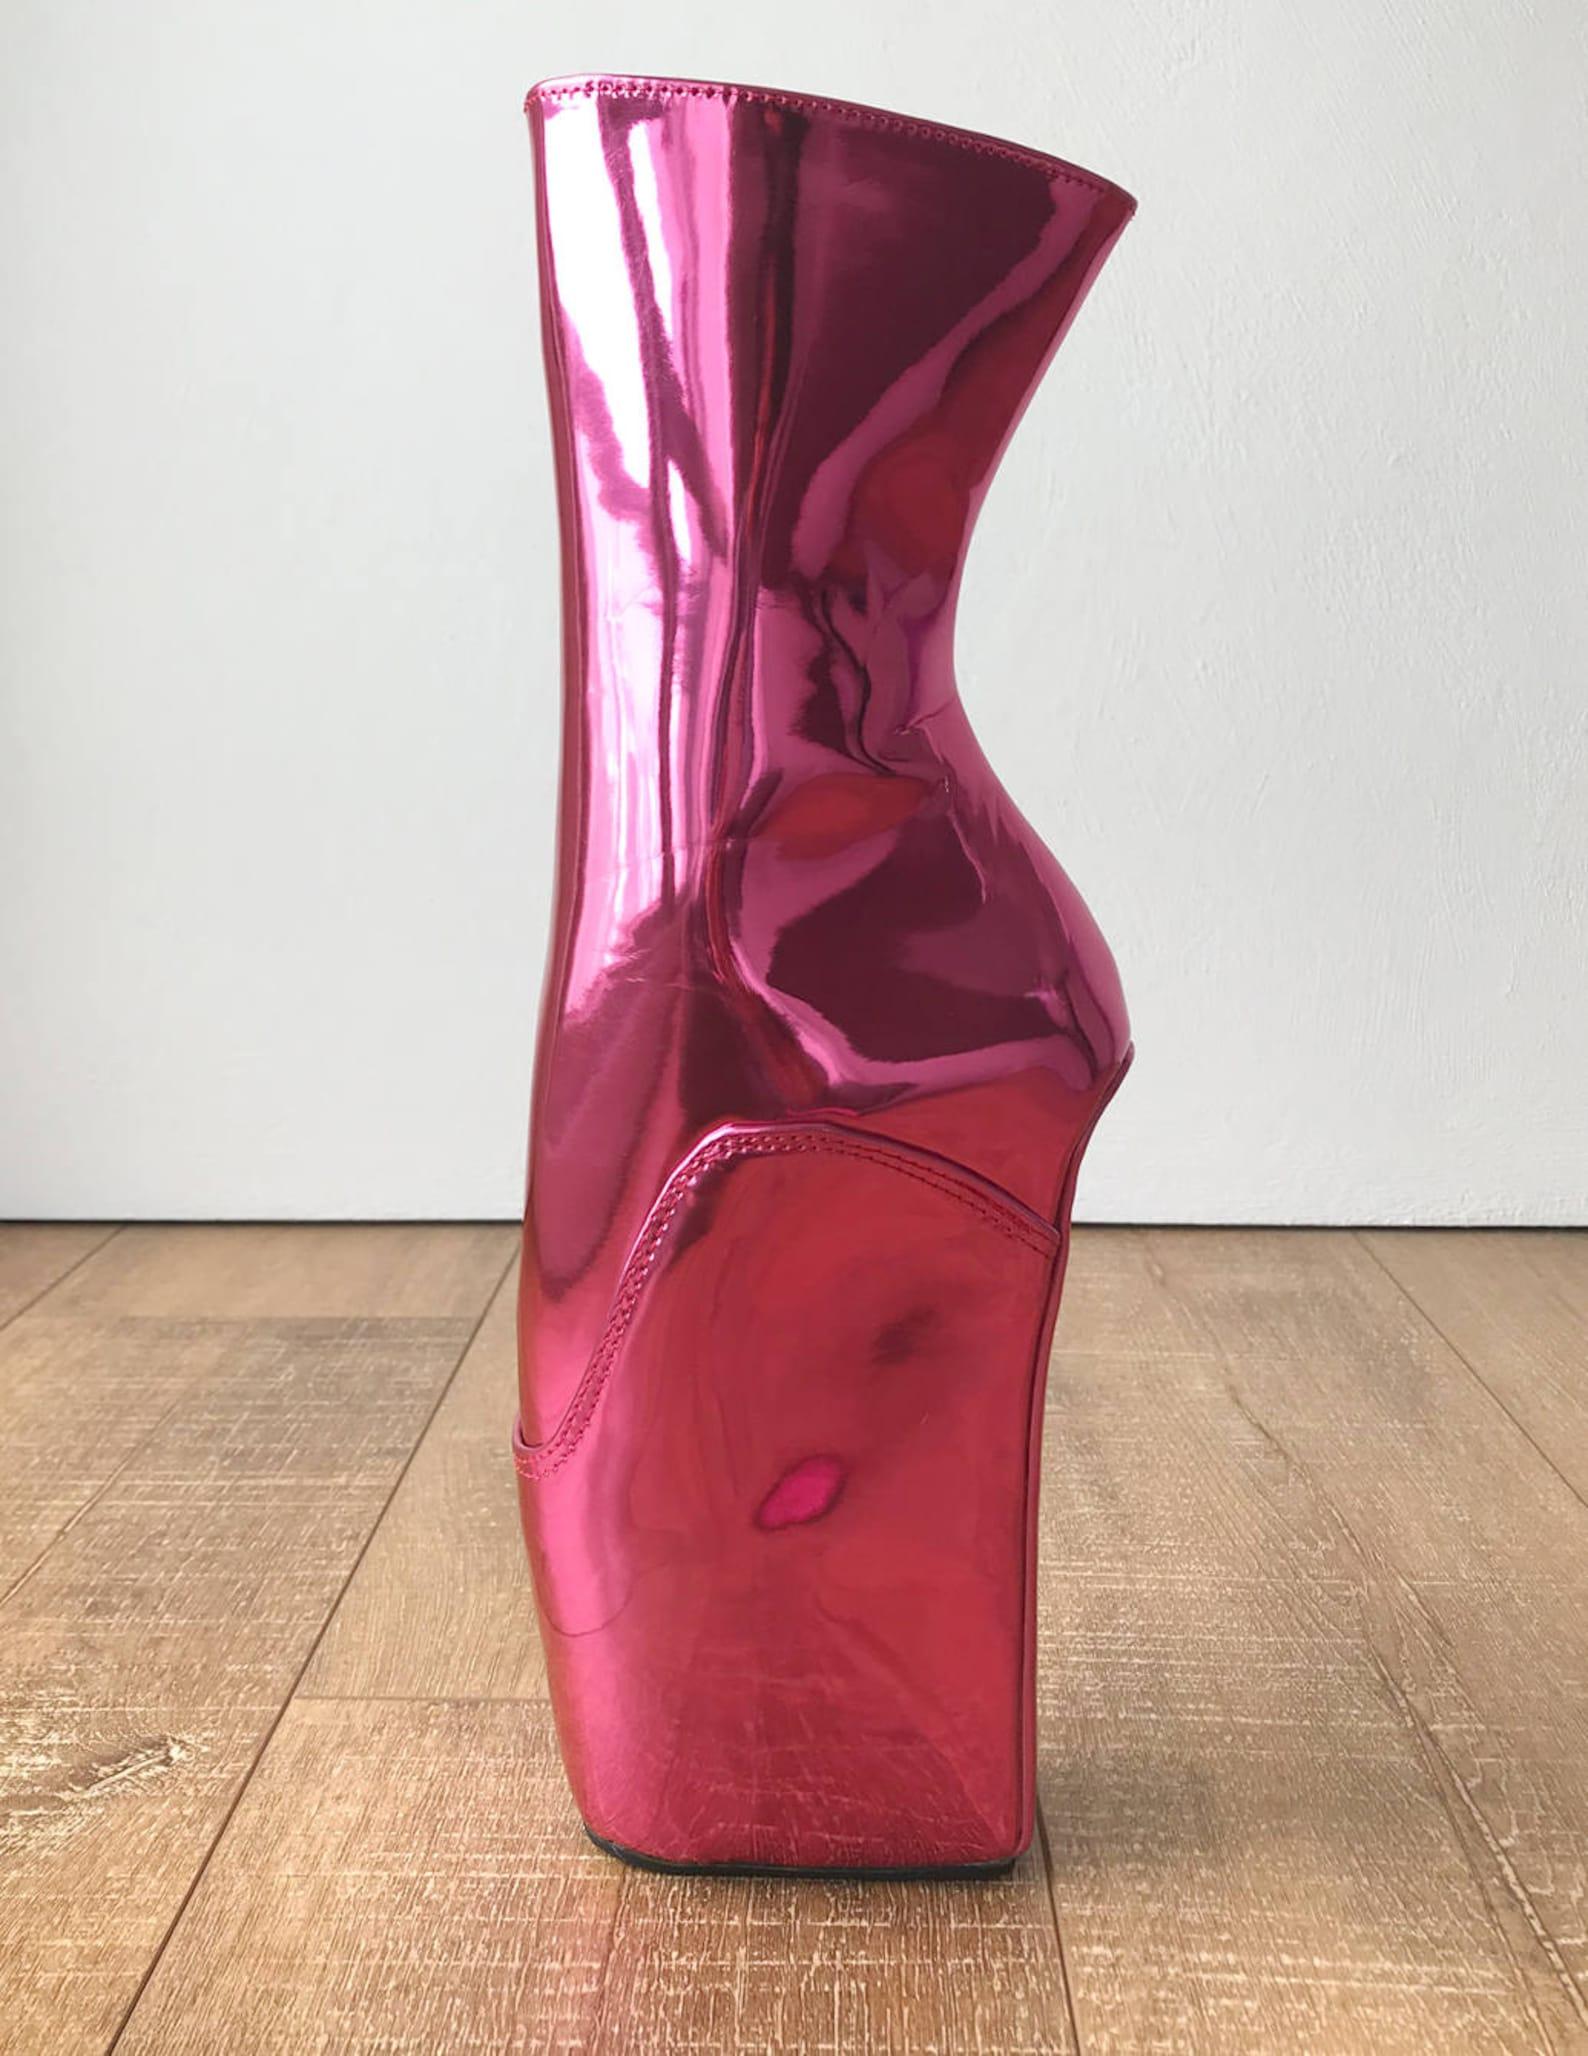 18cm mich hoof sole heelless fetish ballet wedge pointe boot metallic pink